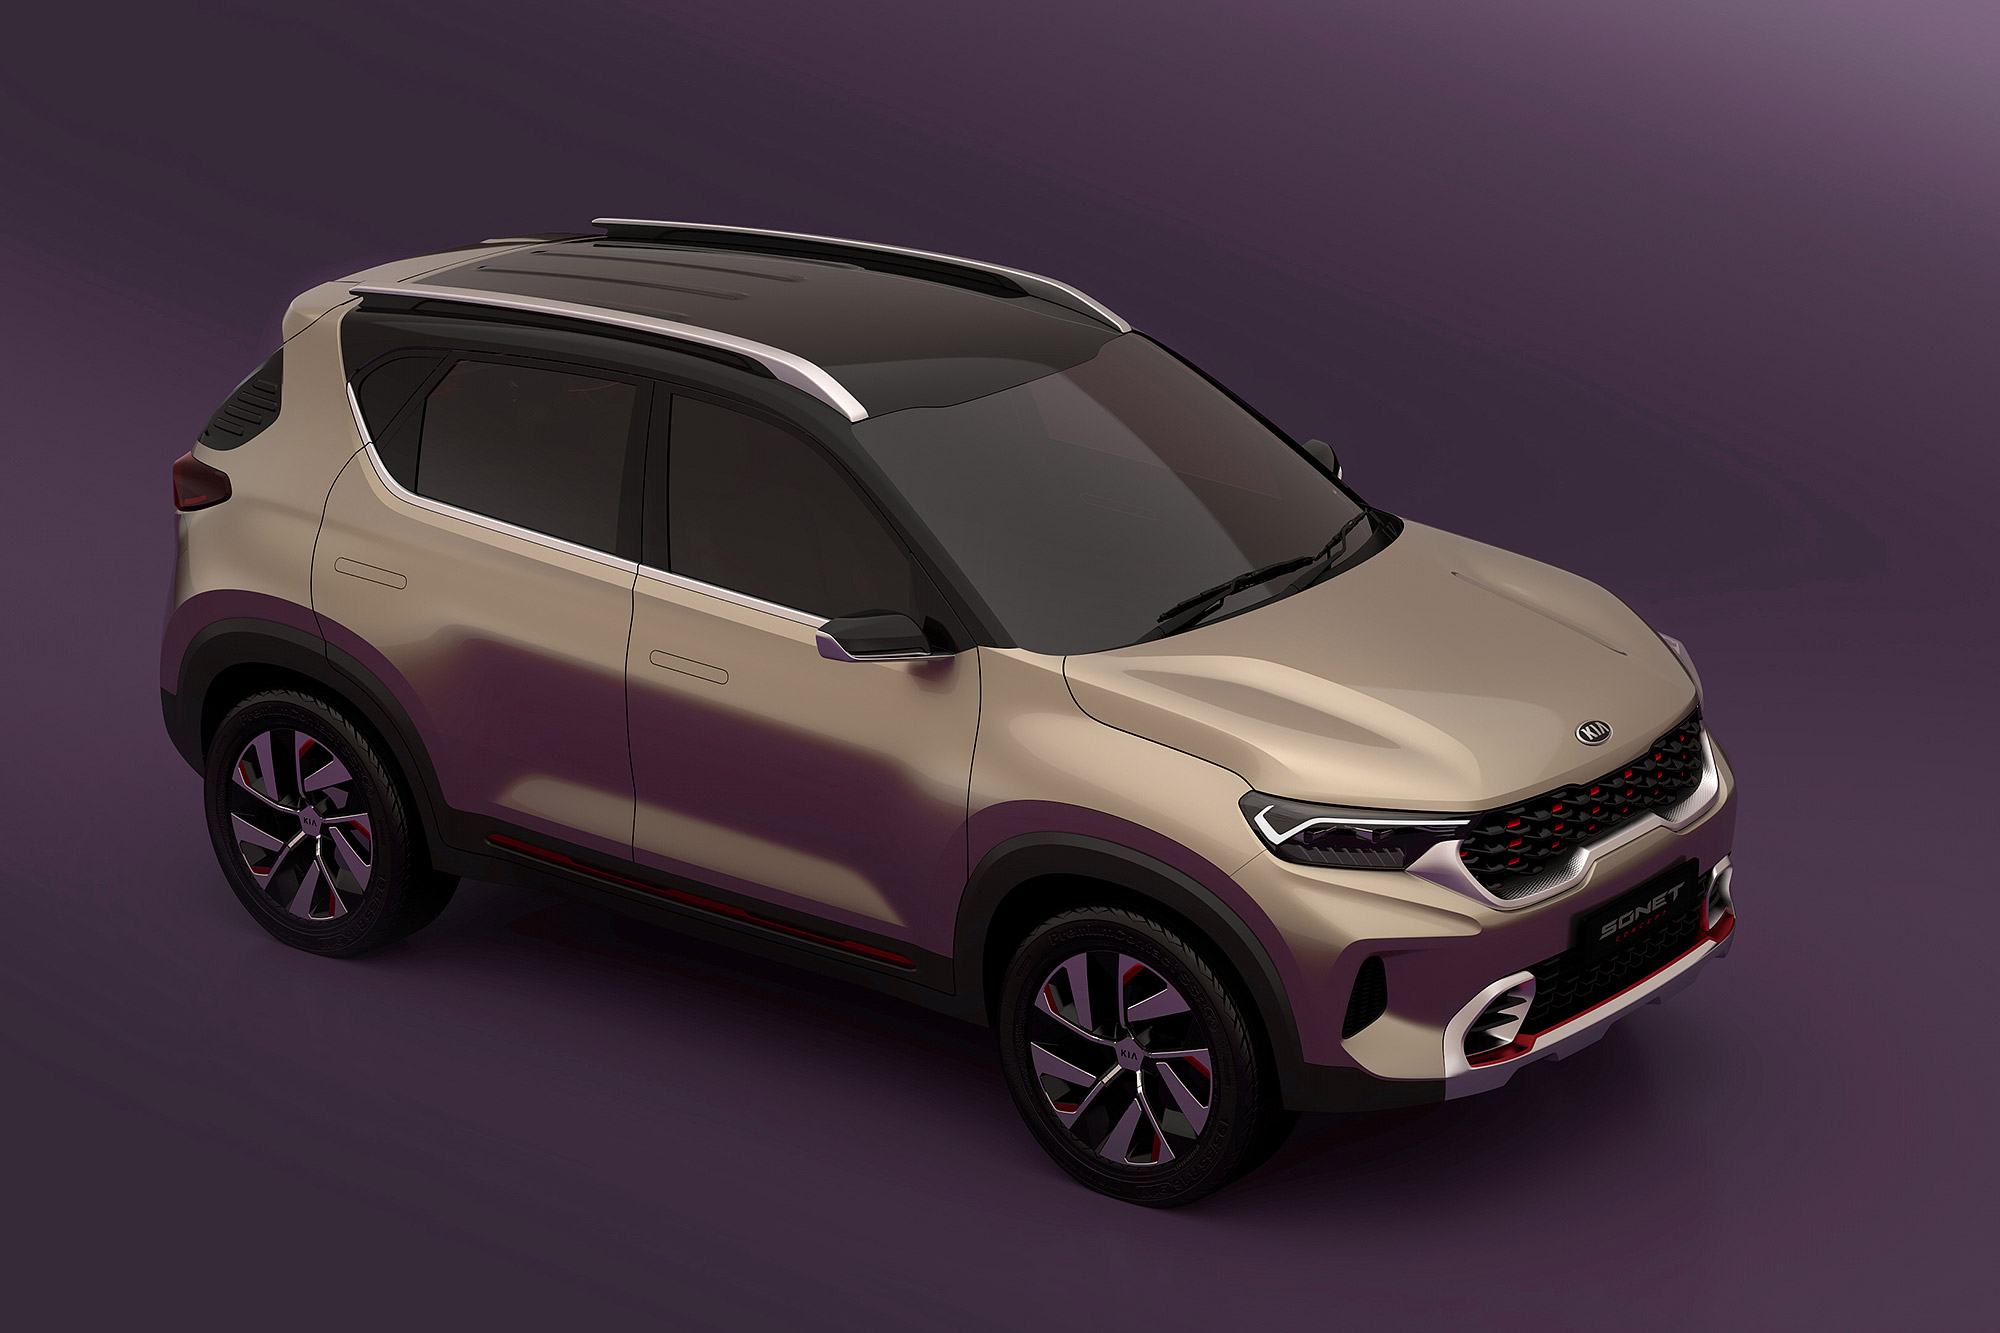 Sonet Concept 車格設定為小型跨界休旅。